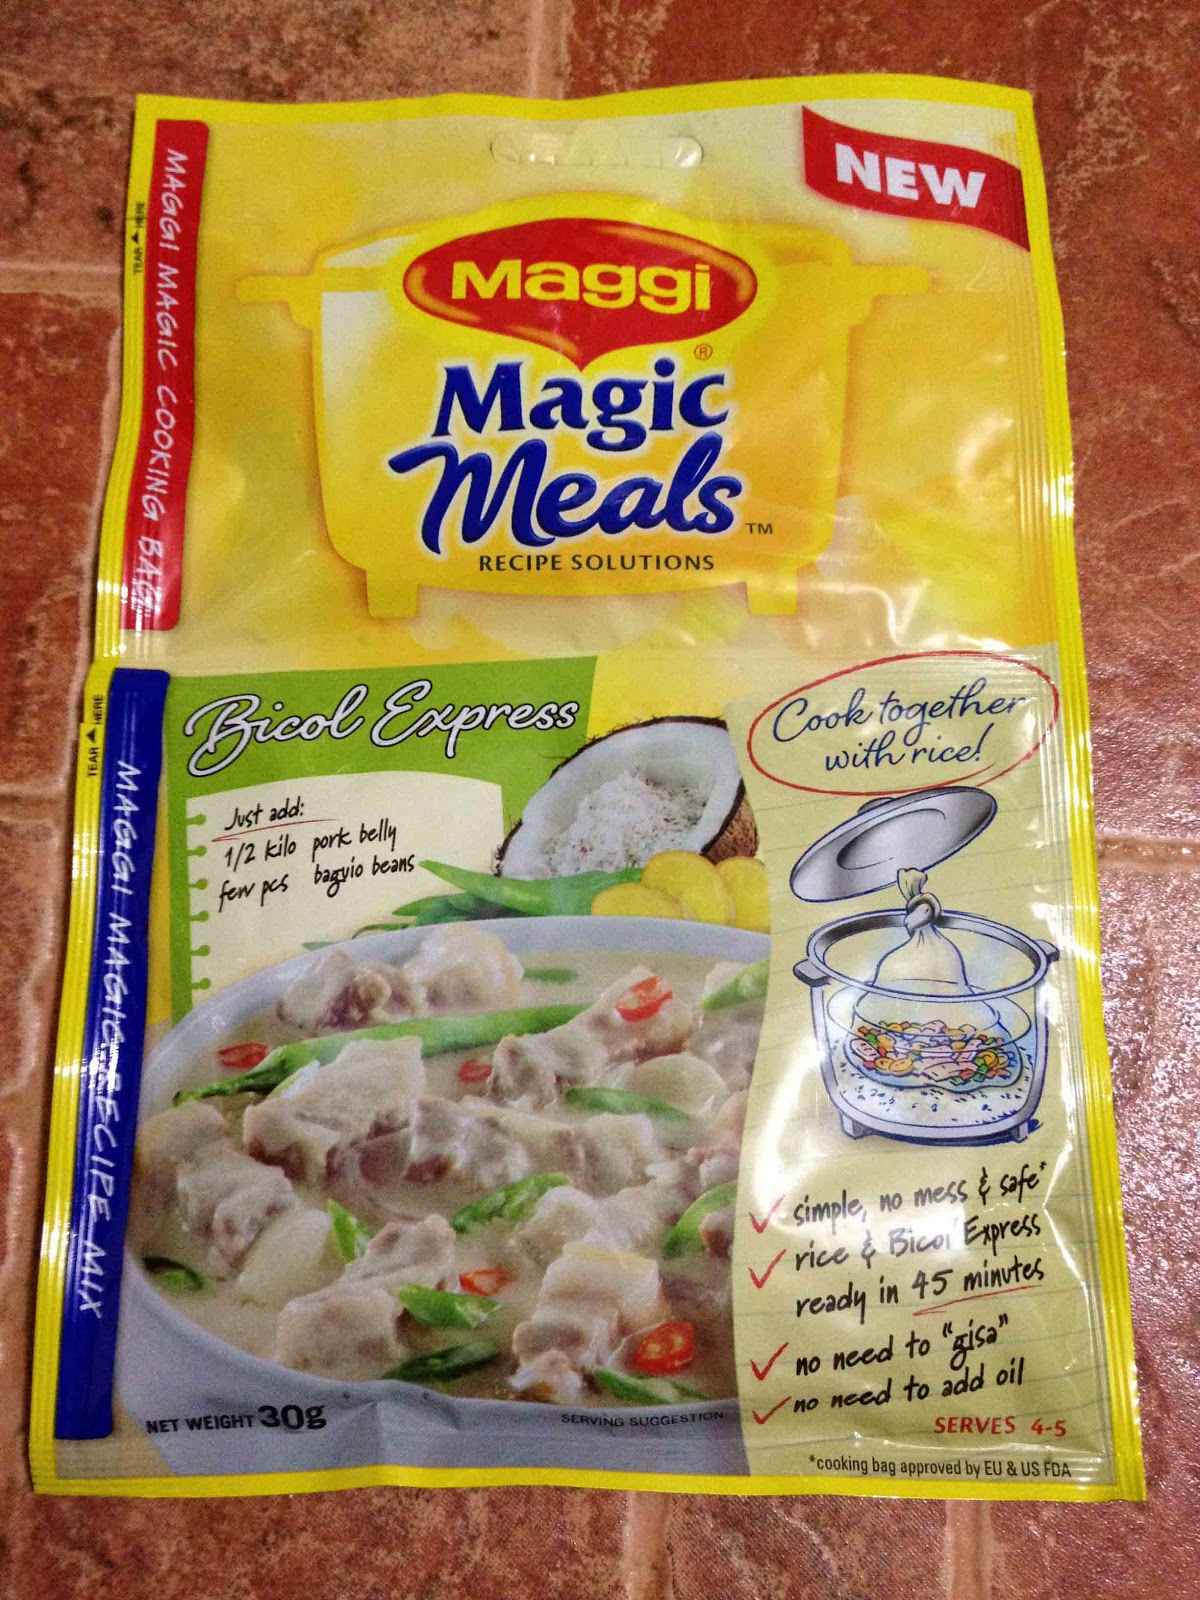 kambrook rice cooker express instructions